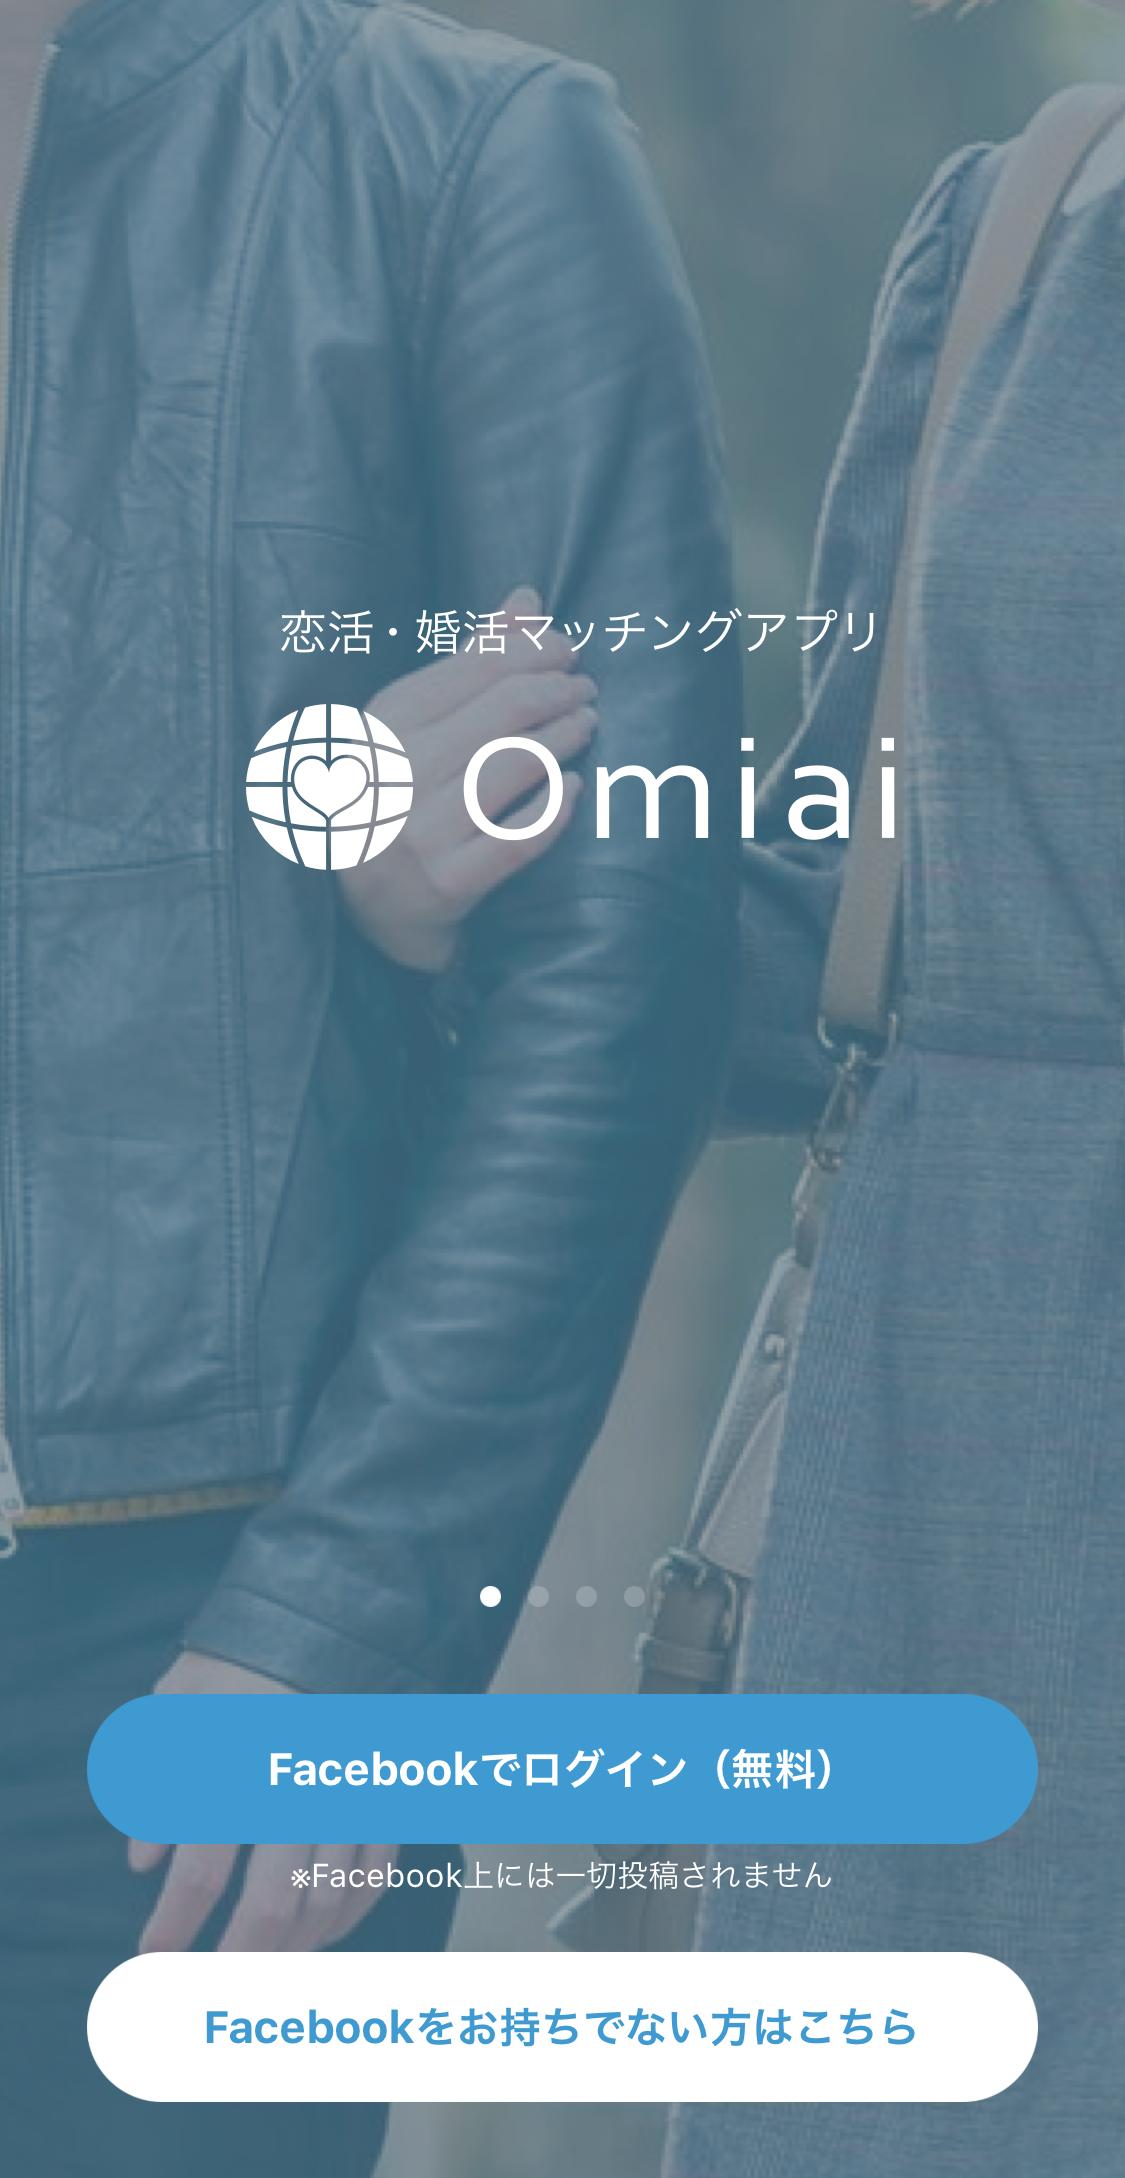 Omiaiの使い方 STEP1:無料登録する